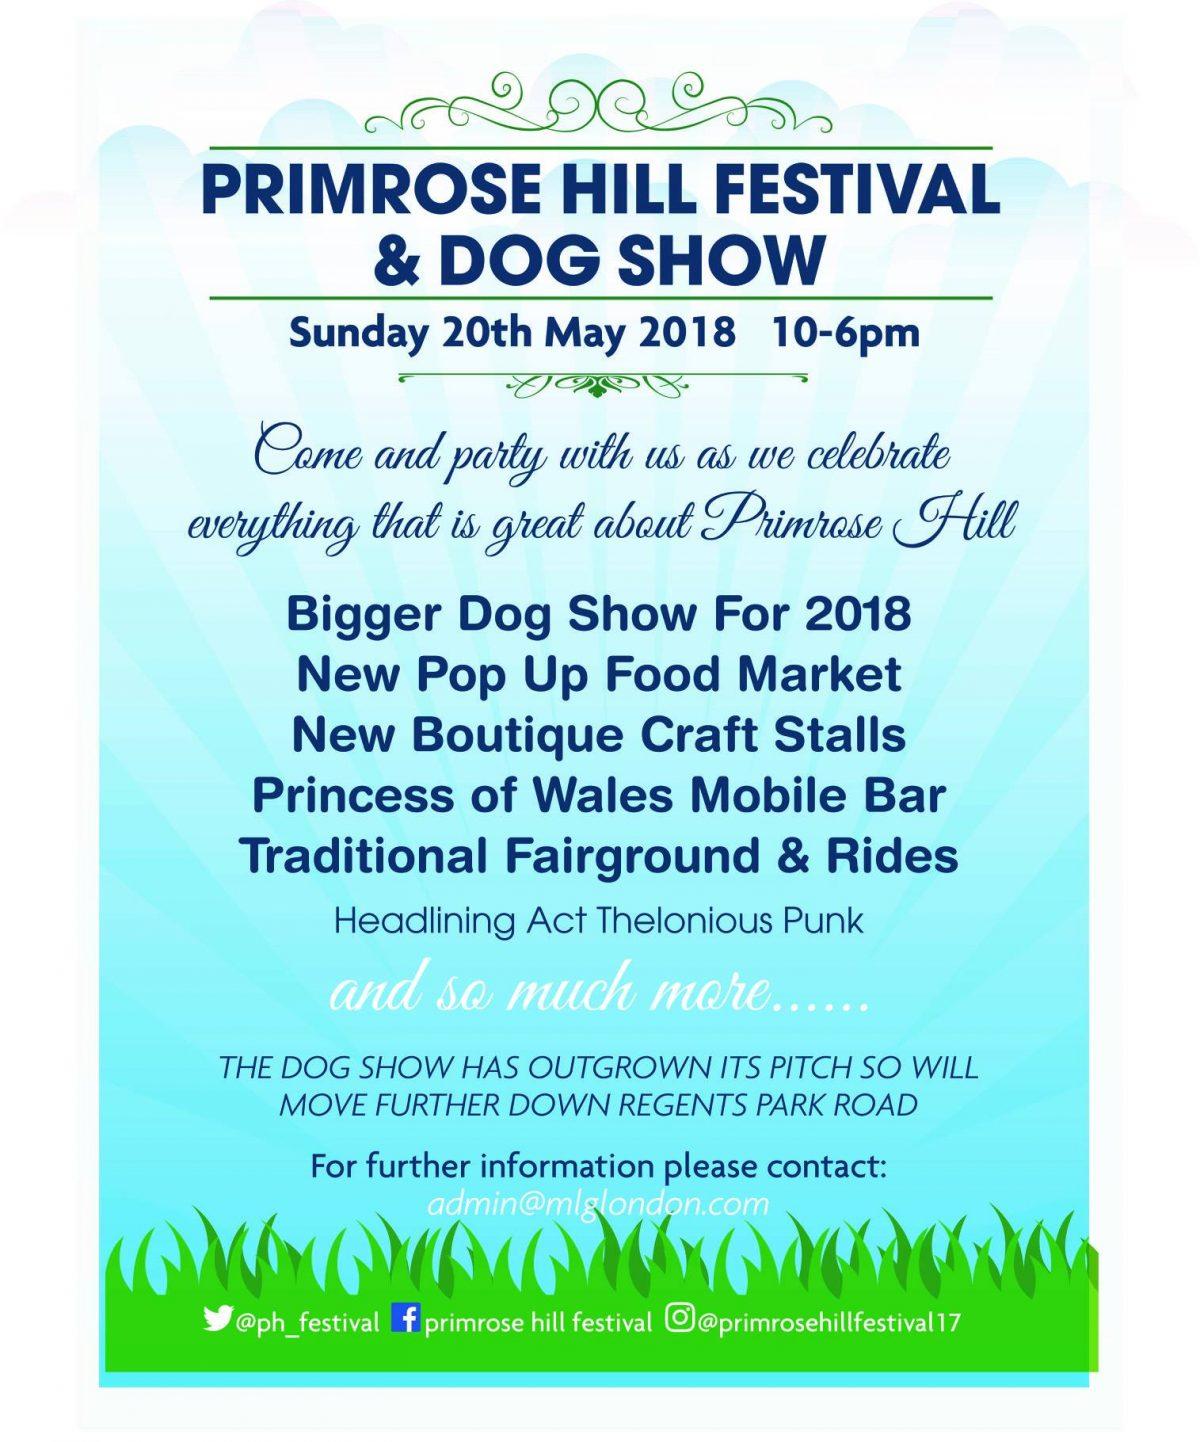 Primrose Hill Festival & Dog Show 2018